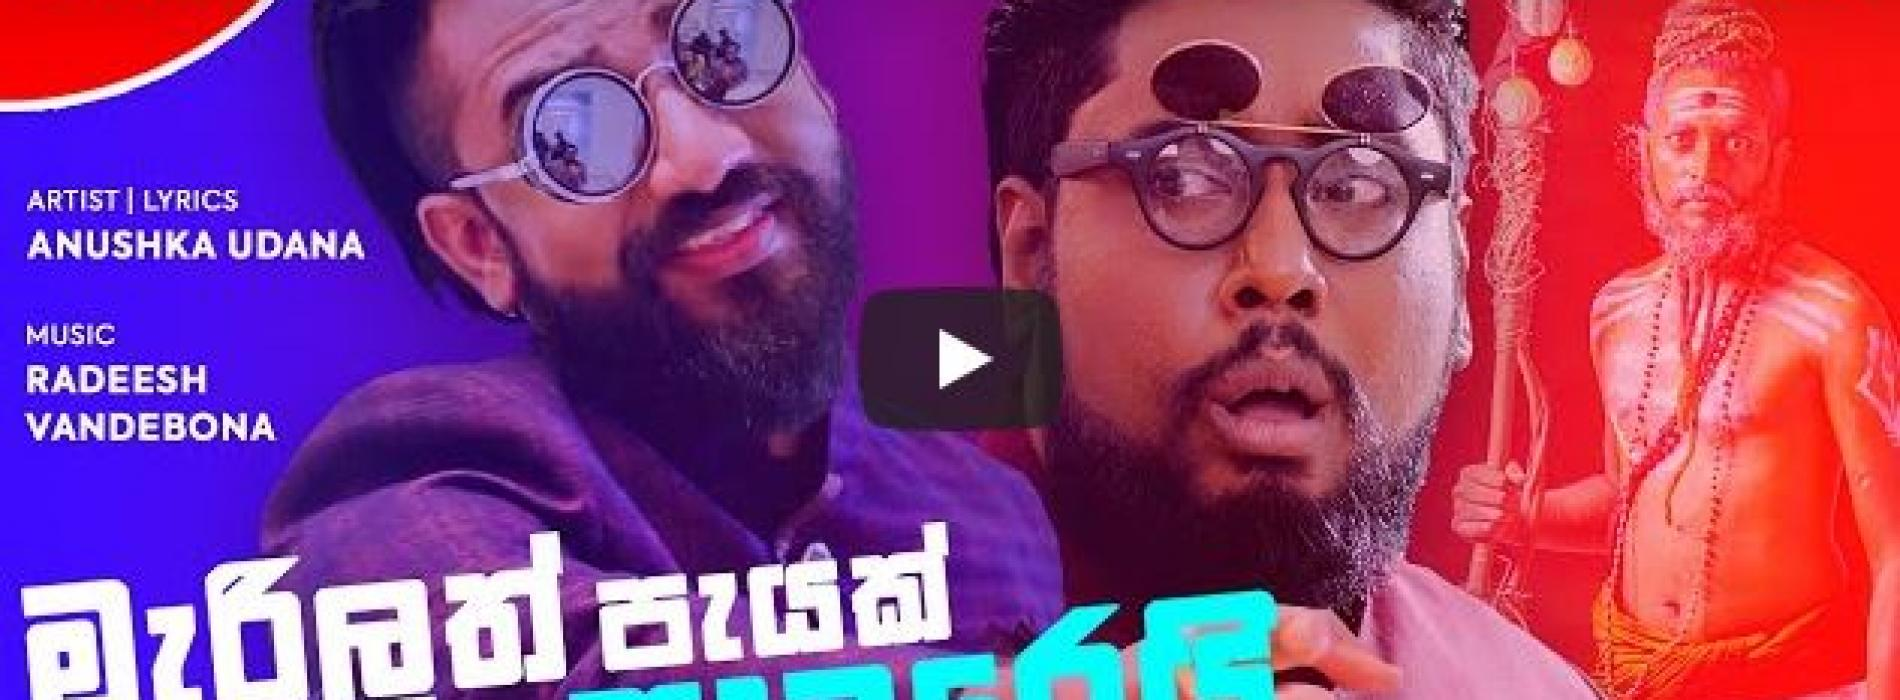 New Music : Wasthi – Uge Appage Mahagedara (Theme Song)